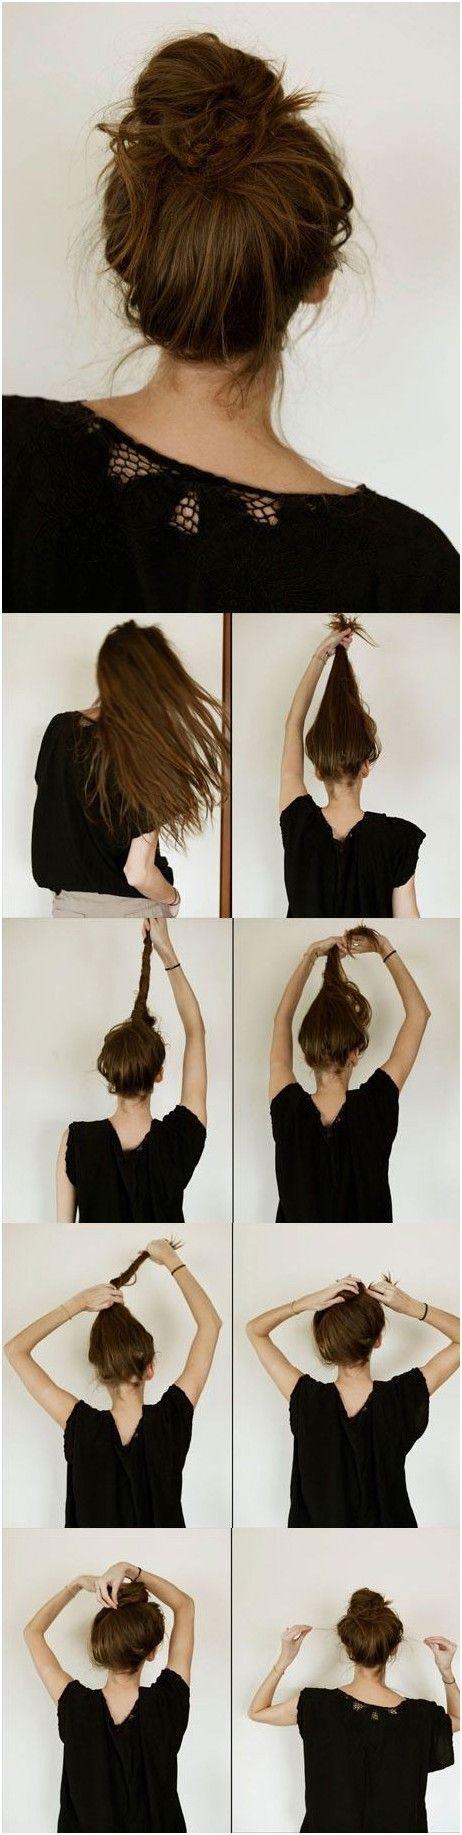 ways to make cute everyday hairstyles long hair tutorials